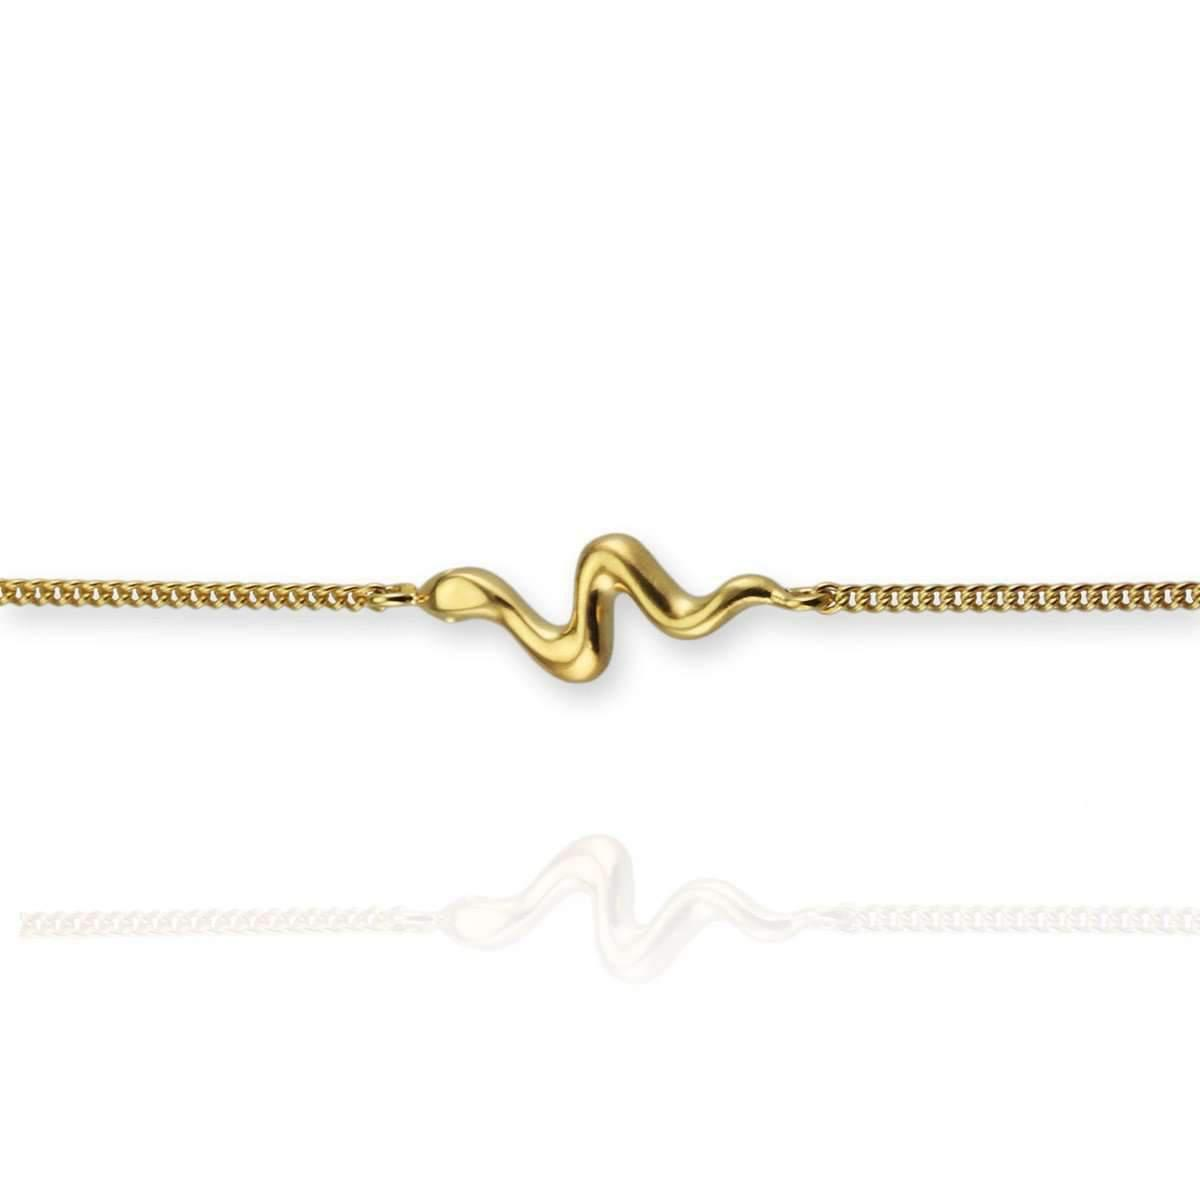 Jana Reinhardt Gold Plated Silver Snake Bangle With Black Diamonds sqdI7gBc